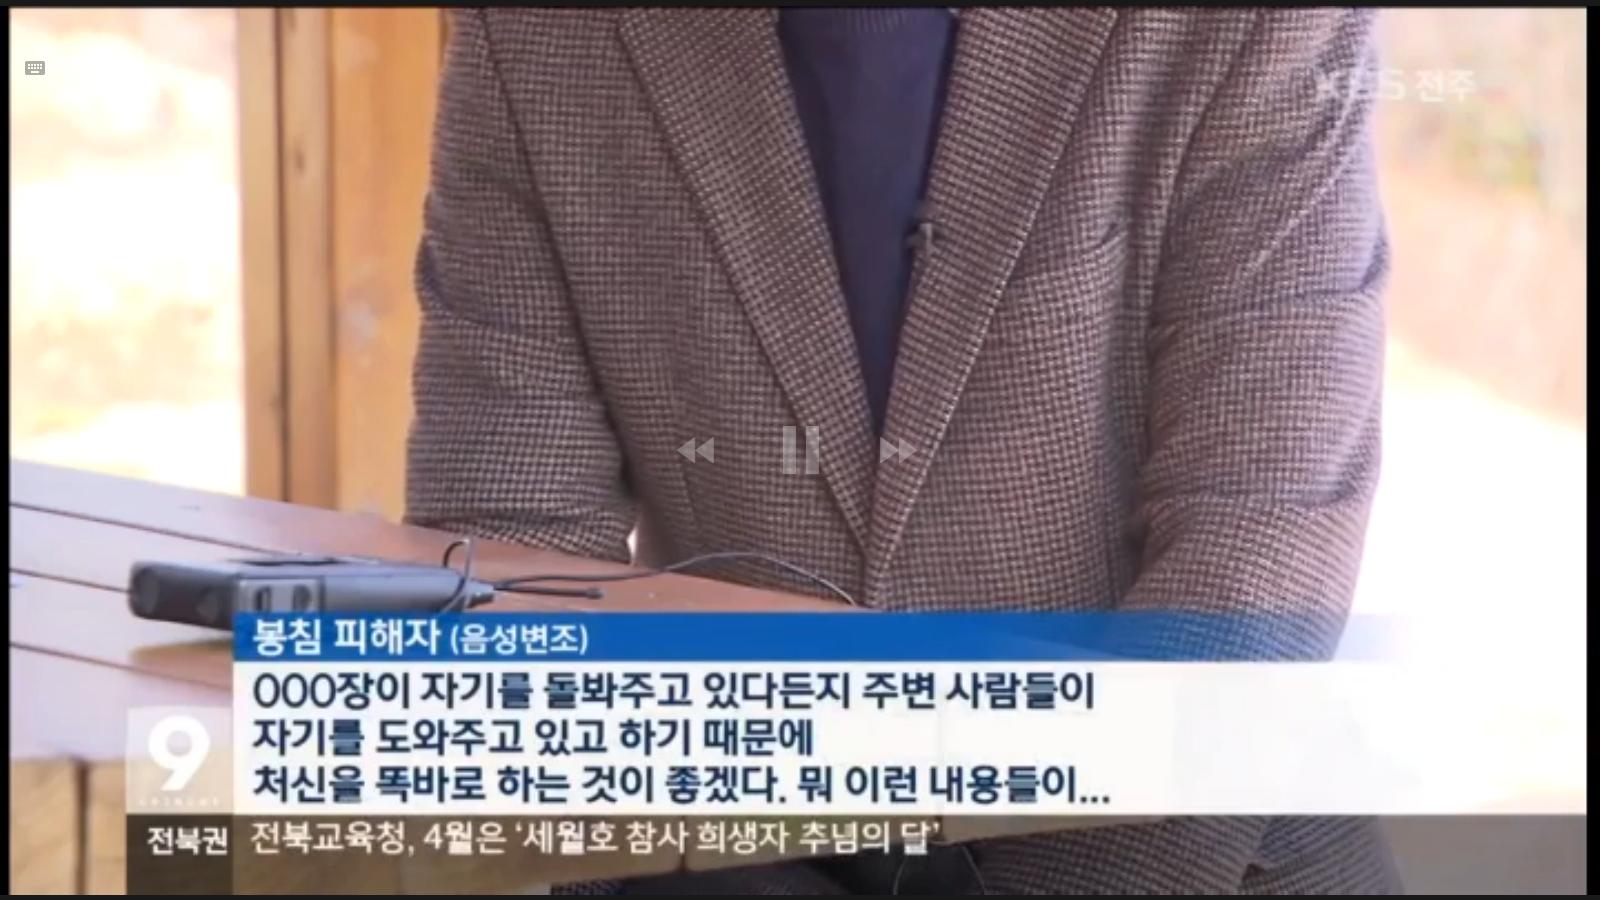 [18.4.4 KBS전주] 전주 봉침게이트, 수사 적정성 요청..귀 닫은 검찰2.jpg